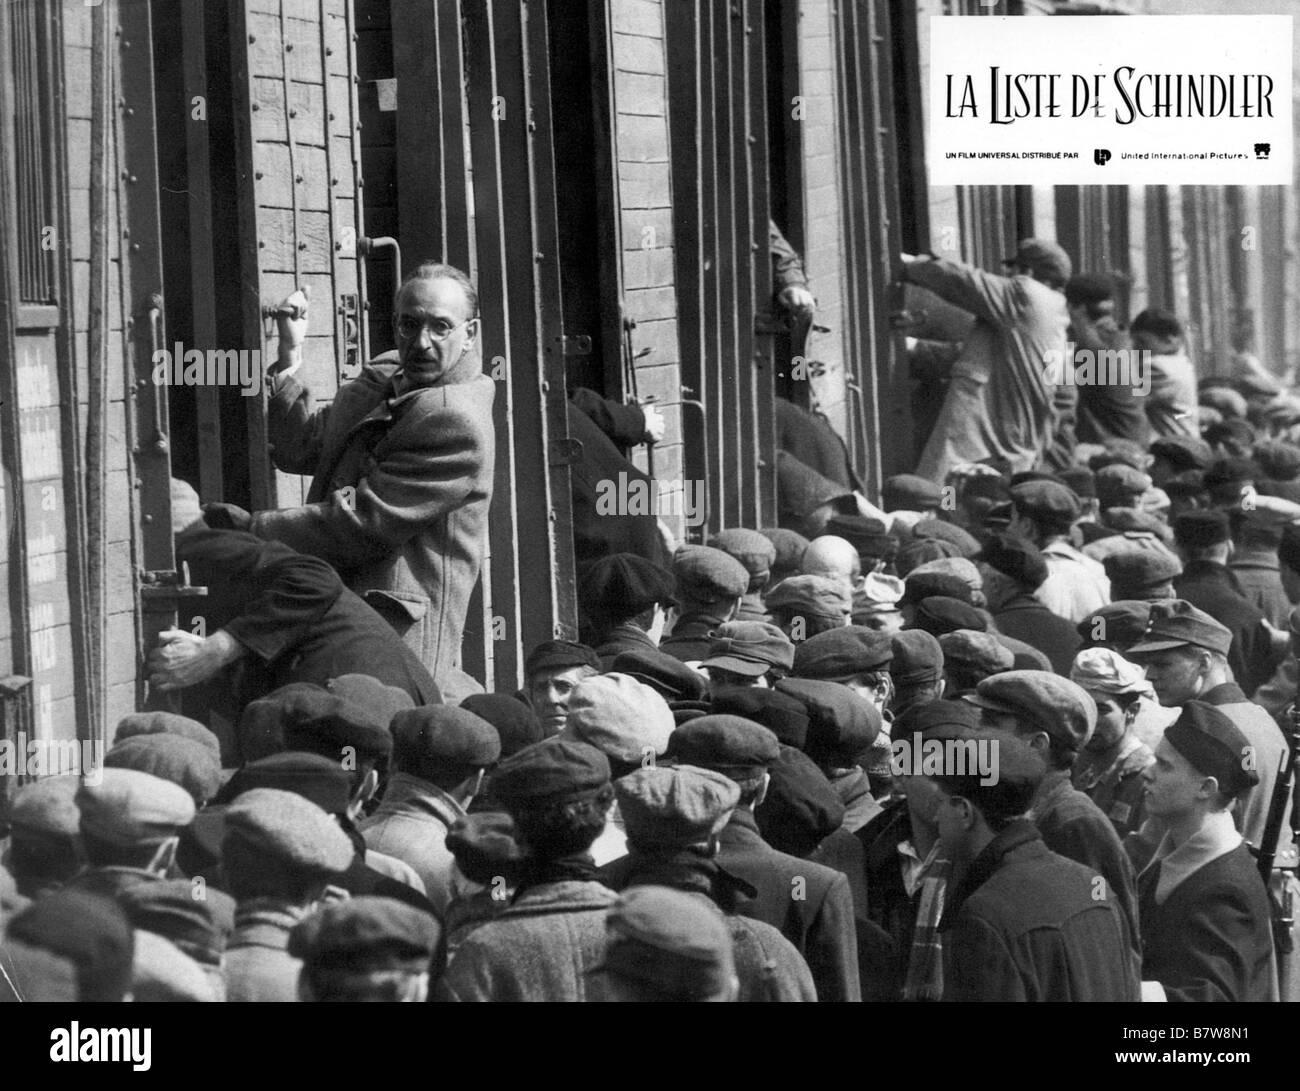 Schindler's List  Year: 1993 USA Ben Kingsley  Director: Steven Spielberg - Stock Image